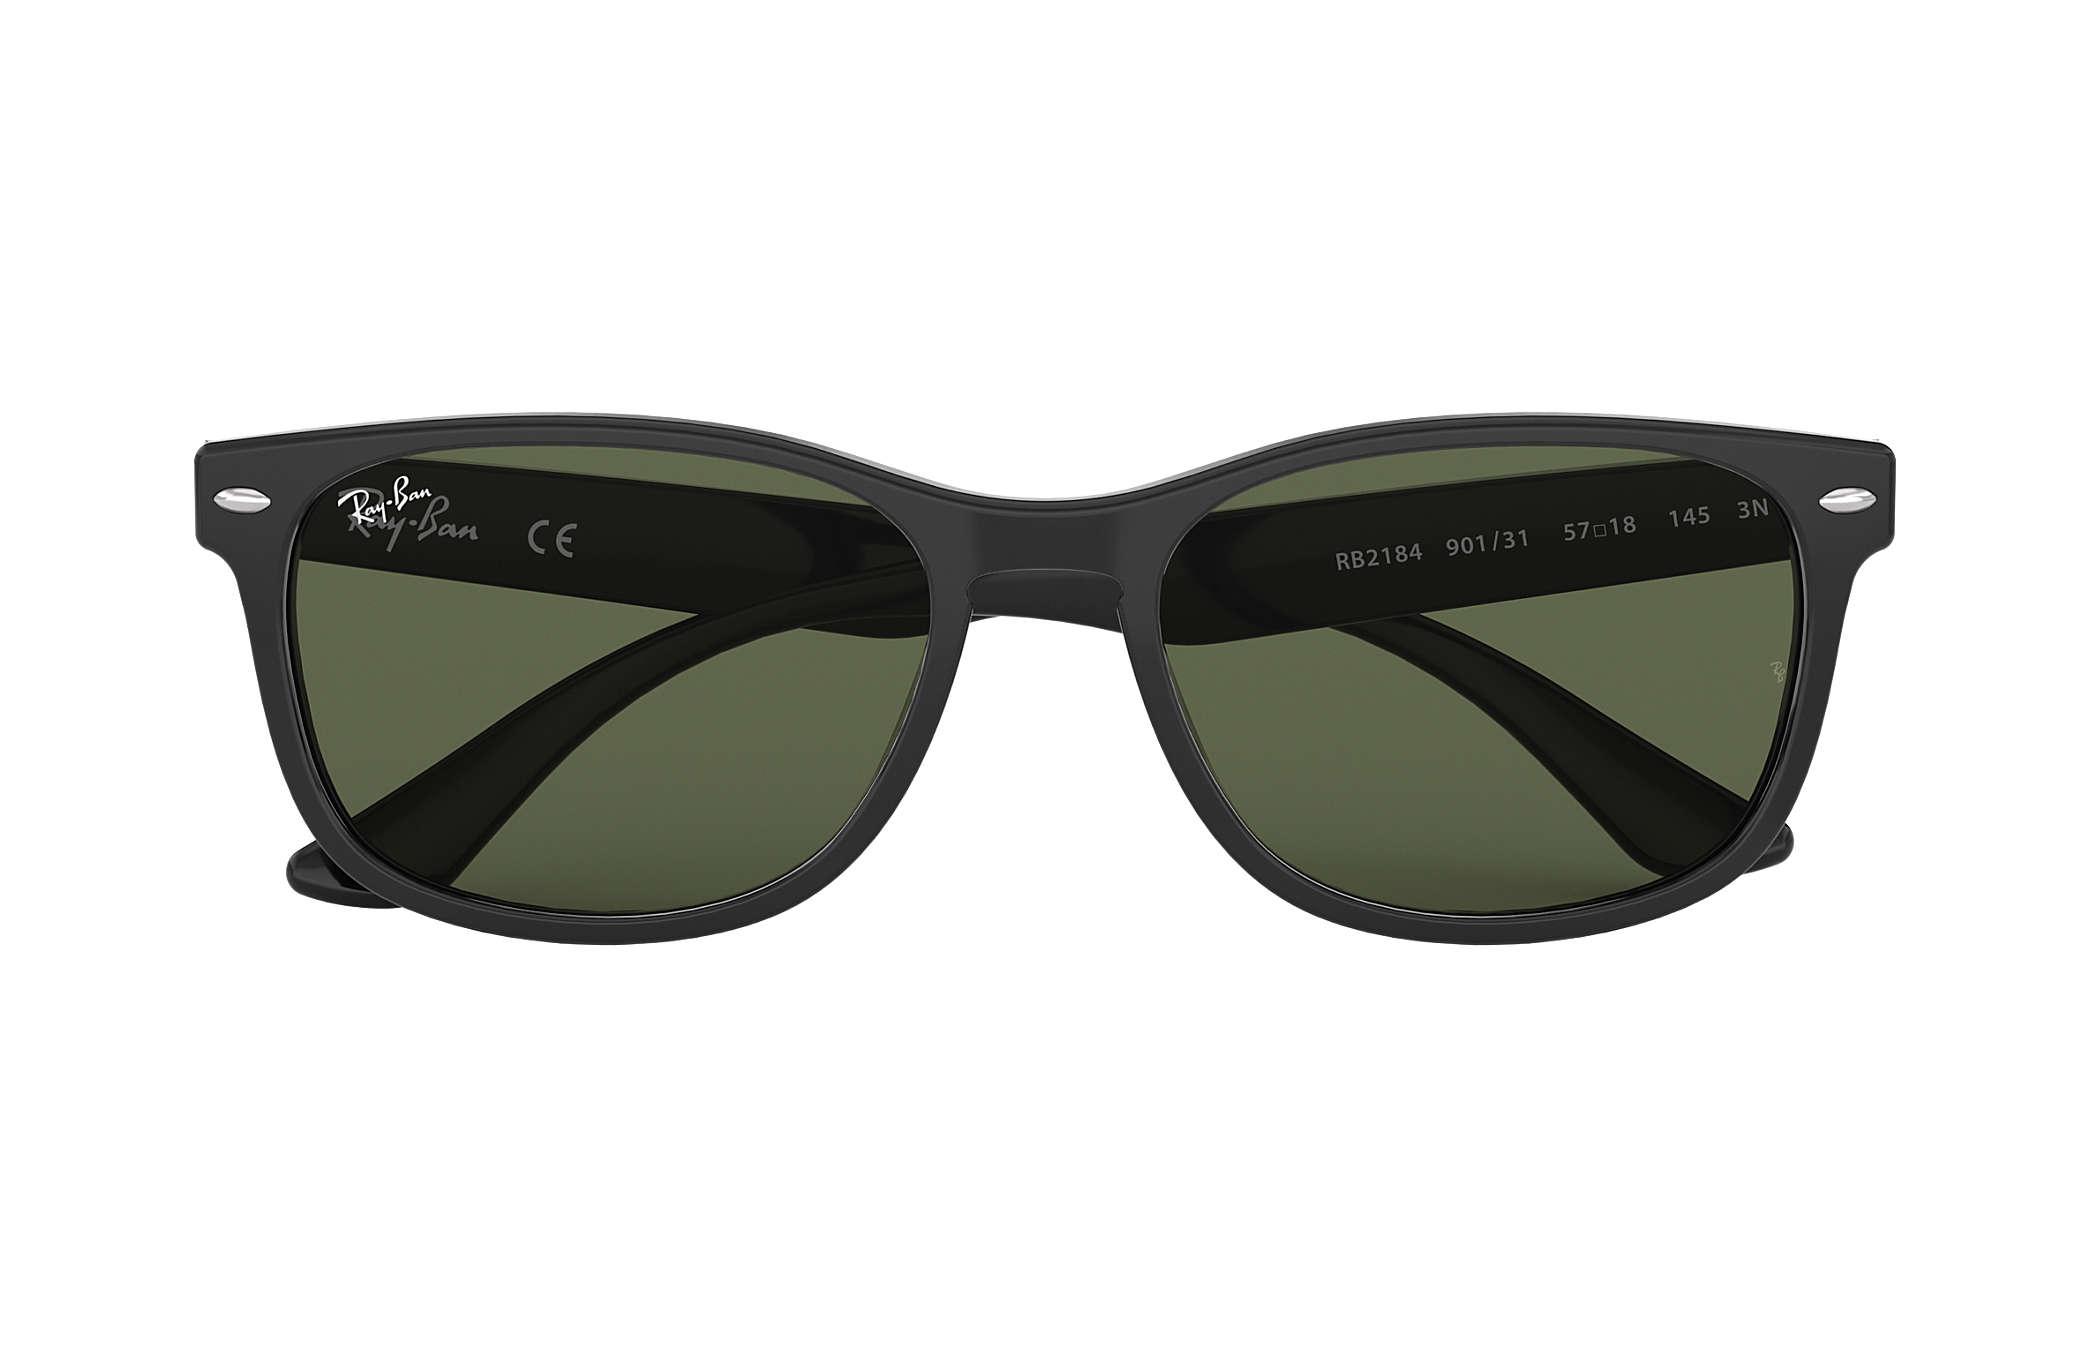 b68496030dd Ray-Ban RB2184 Black - Acetate - Green Lenses - 0RB2184901 3157 ...